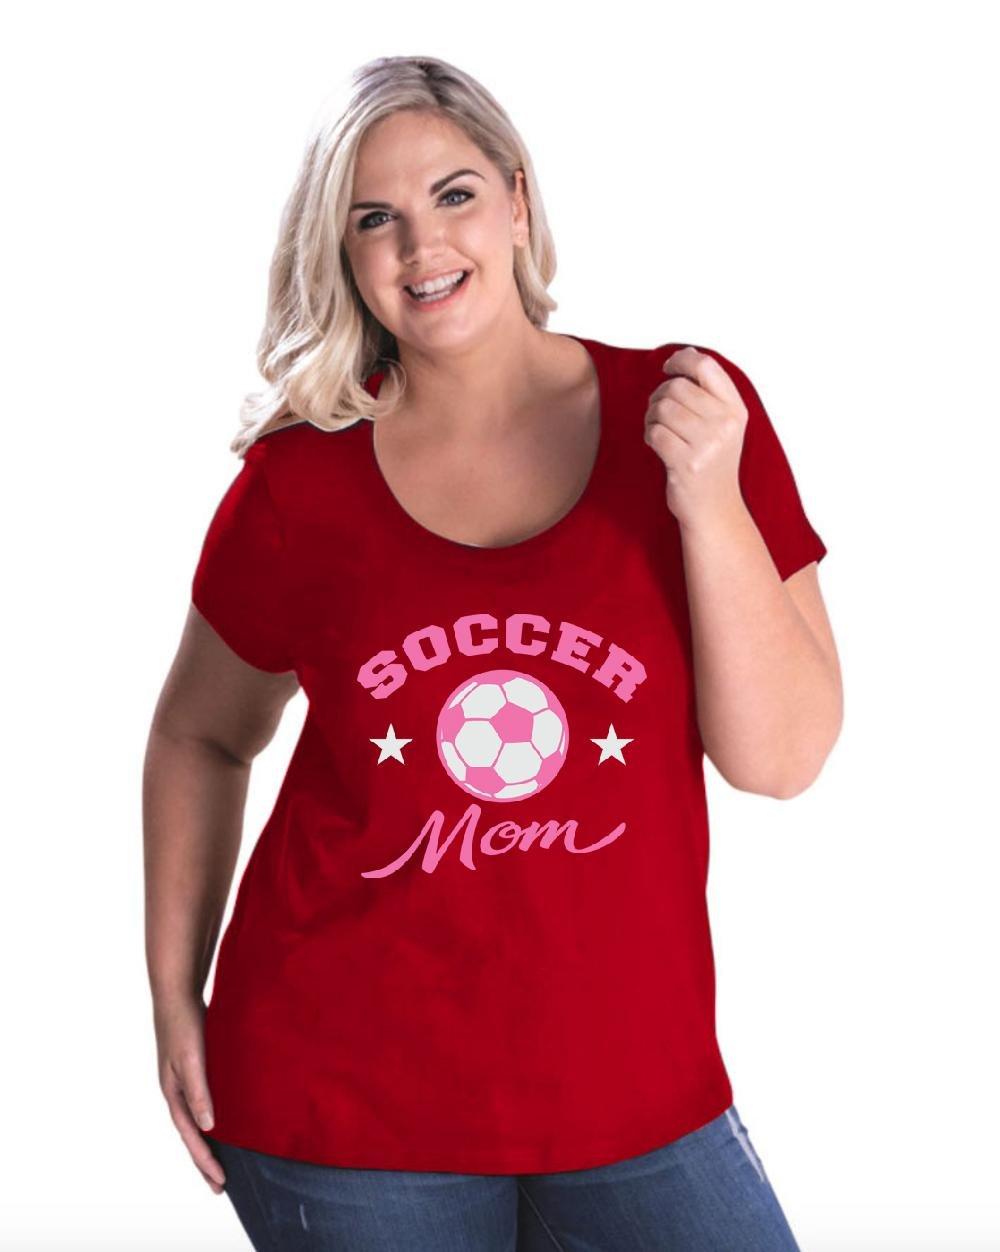 Soccer Fan Gift Soccer Mom Curvy Plus Scoopneck Tee 7483 Shirts